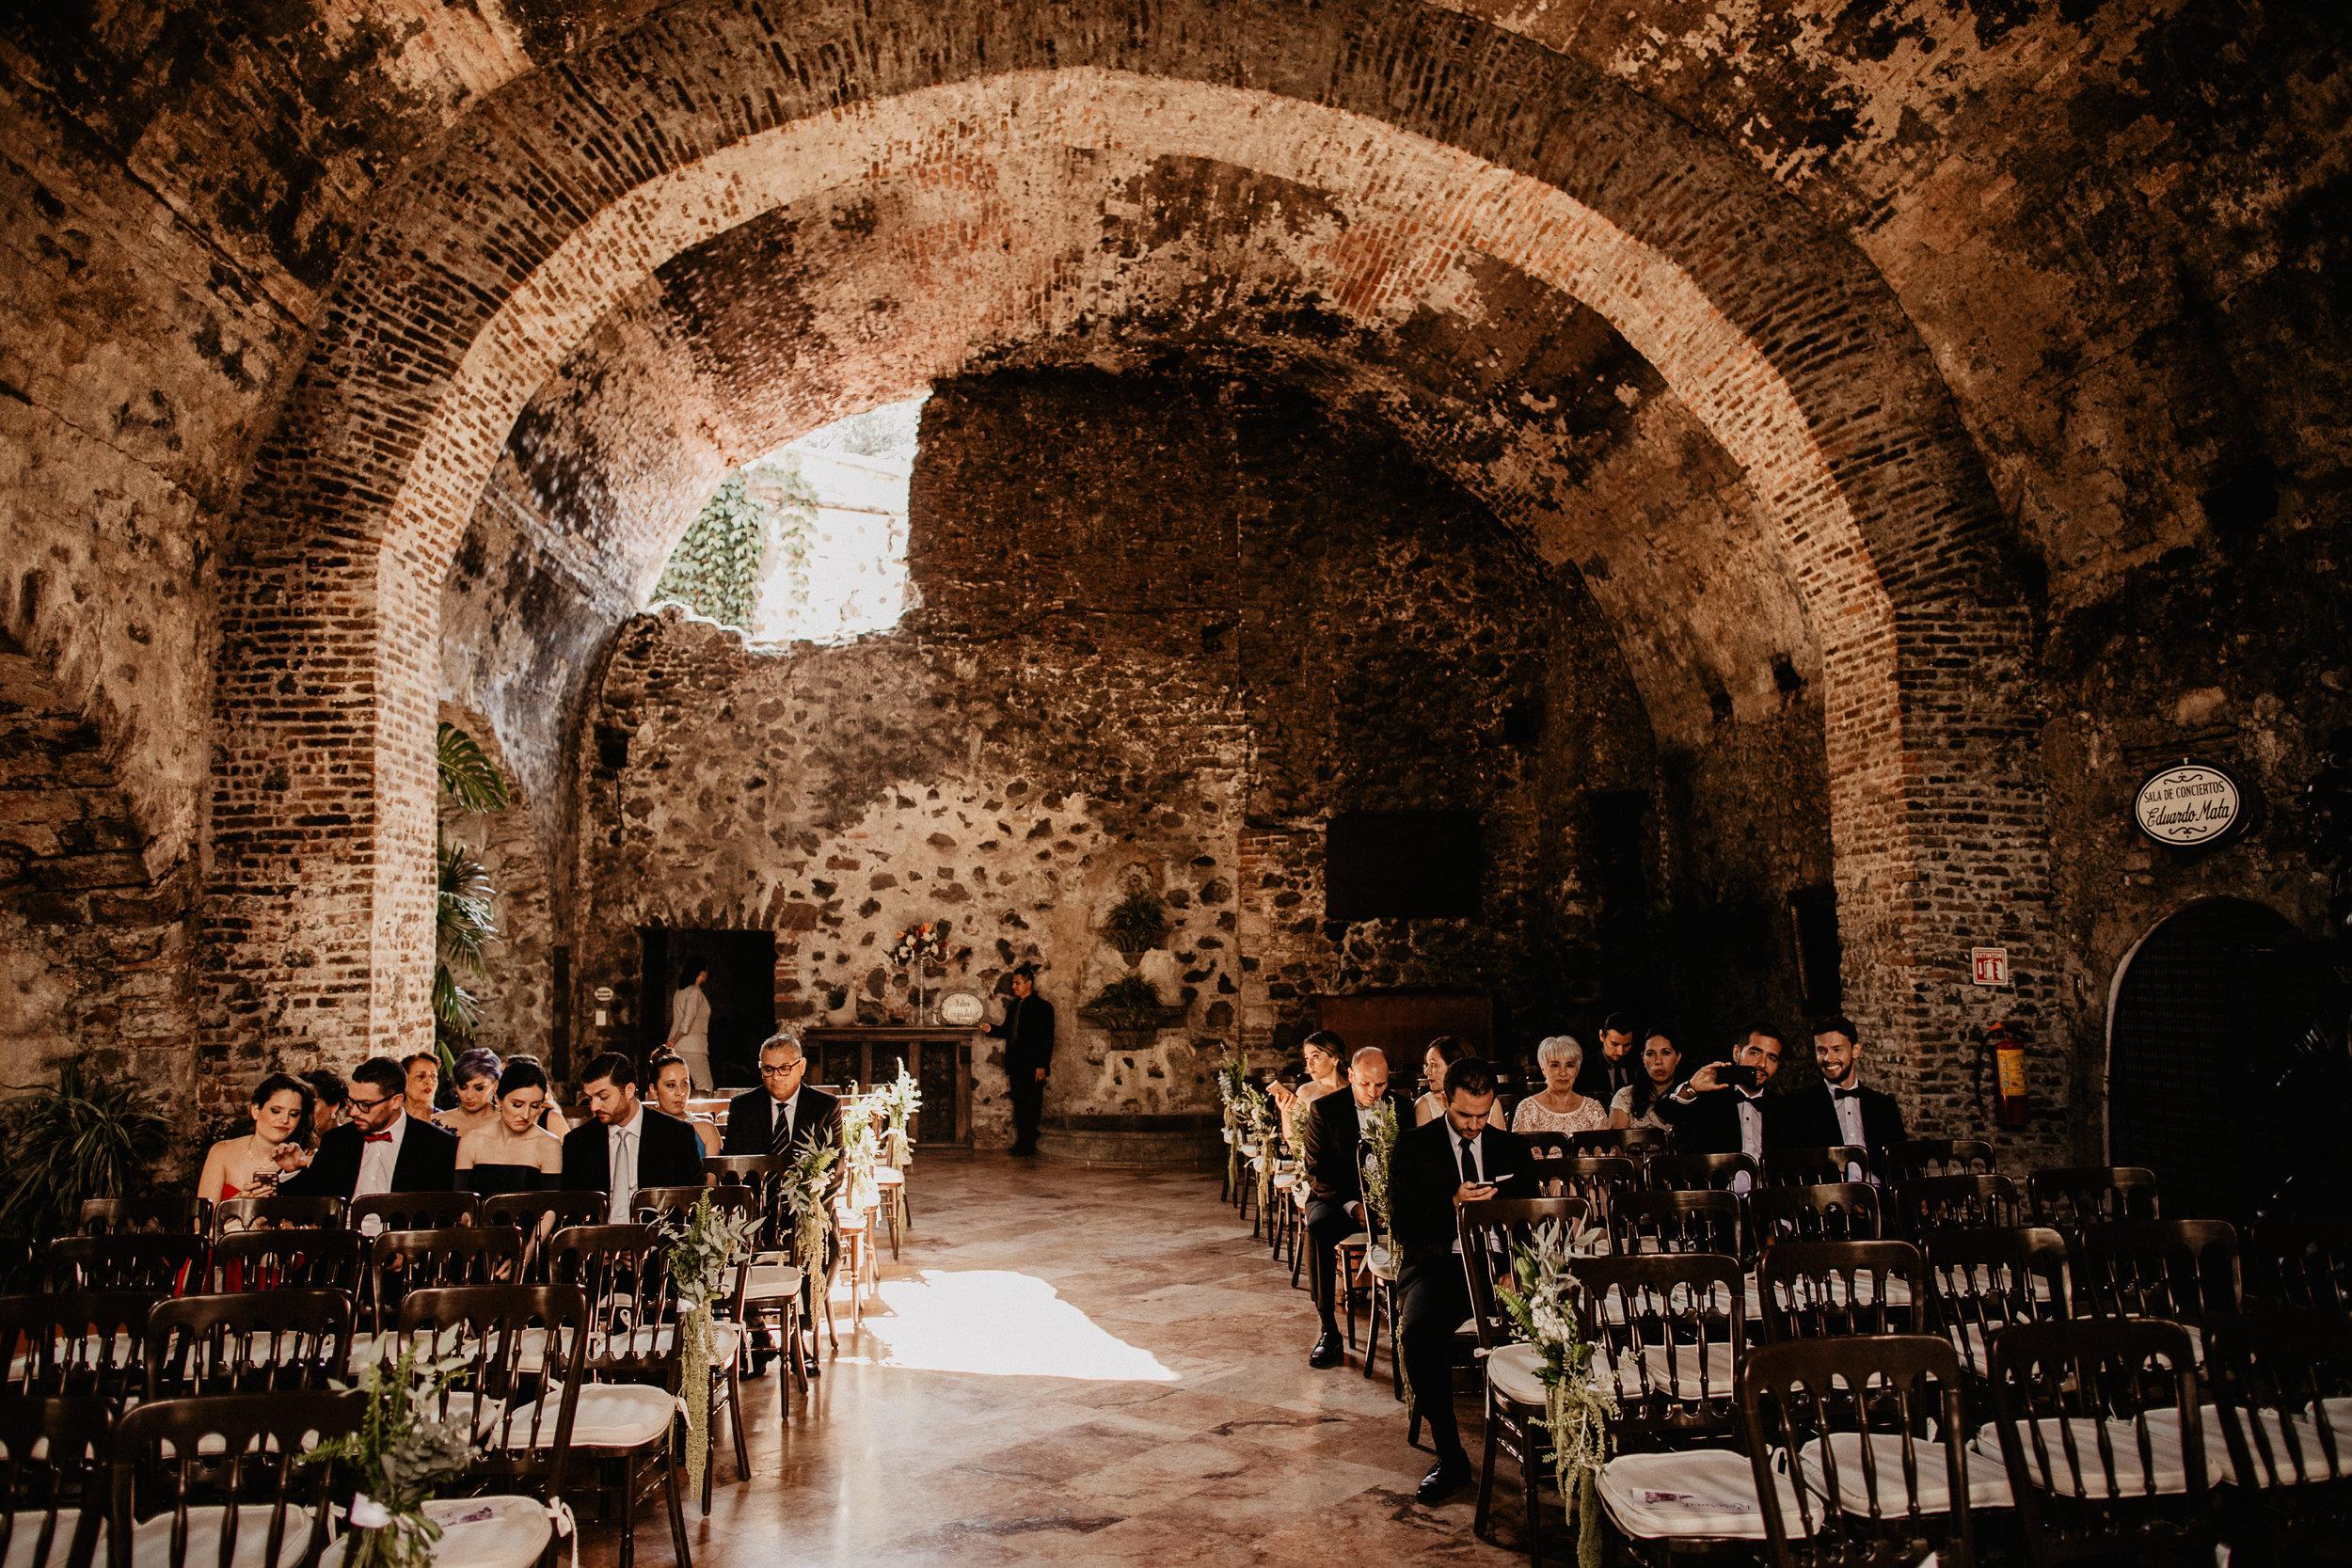 Alfonso_flores_destination_wedding_photography_vanesa_carlos-380.JPG